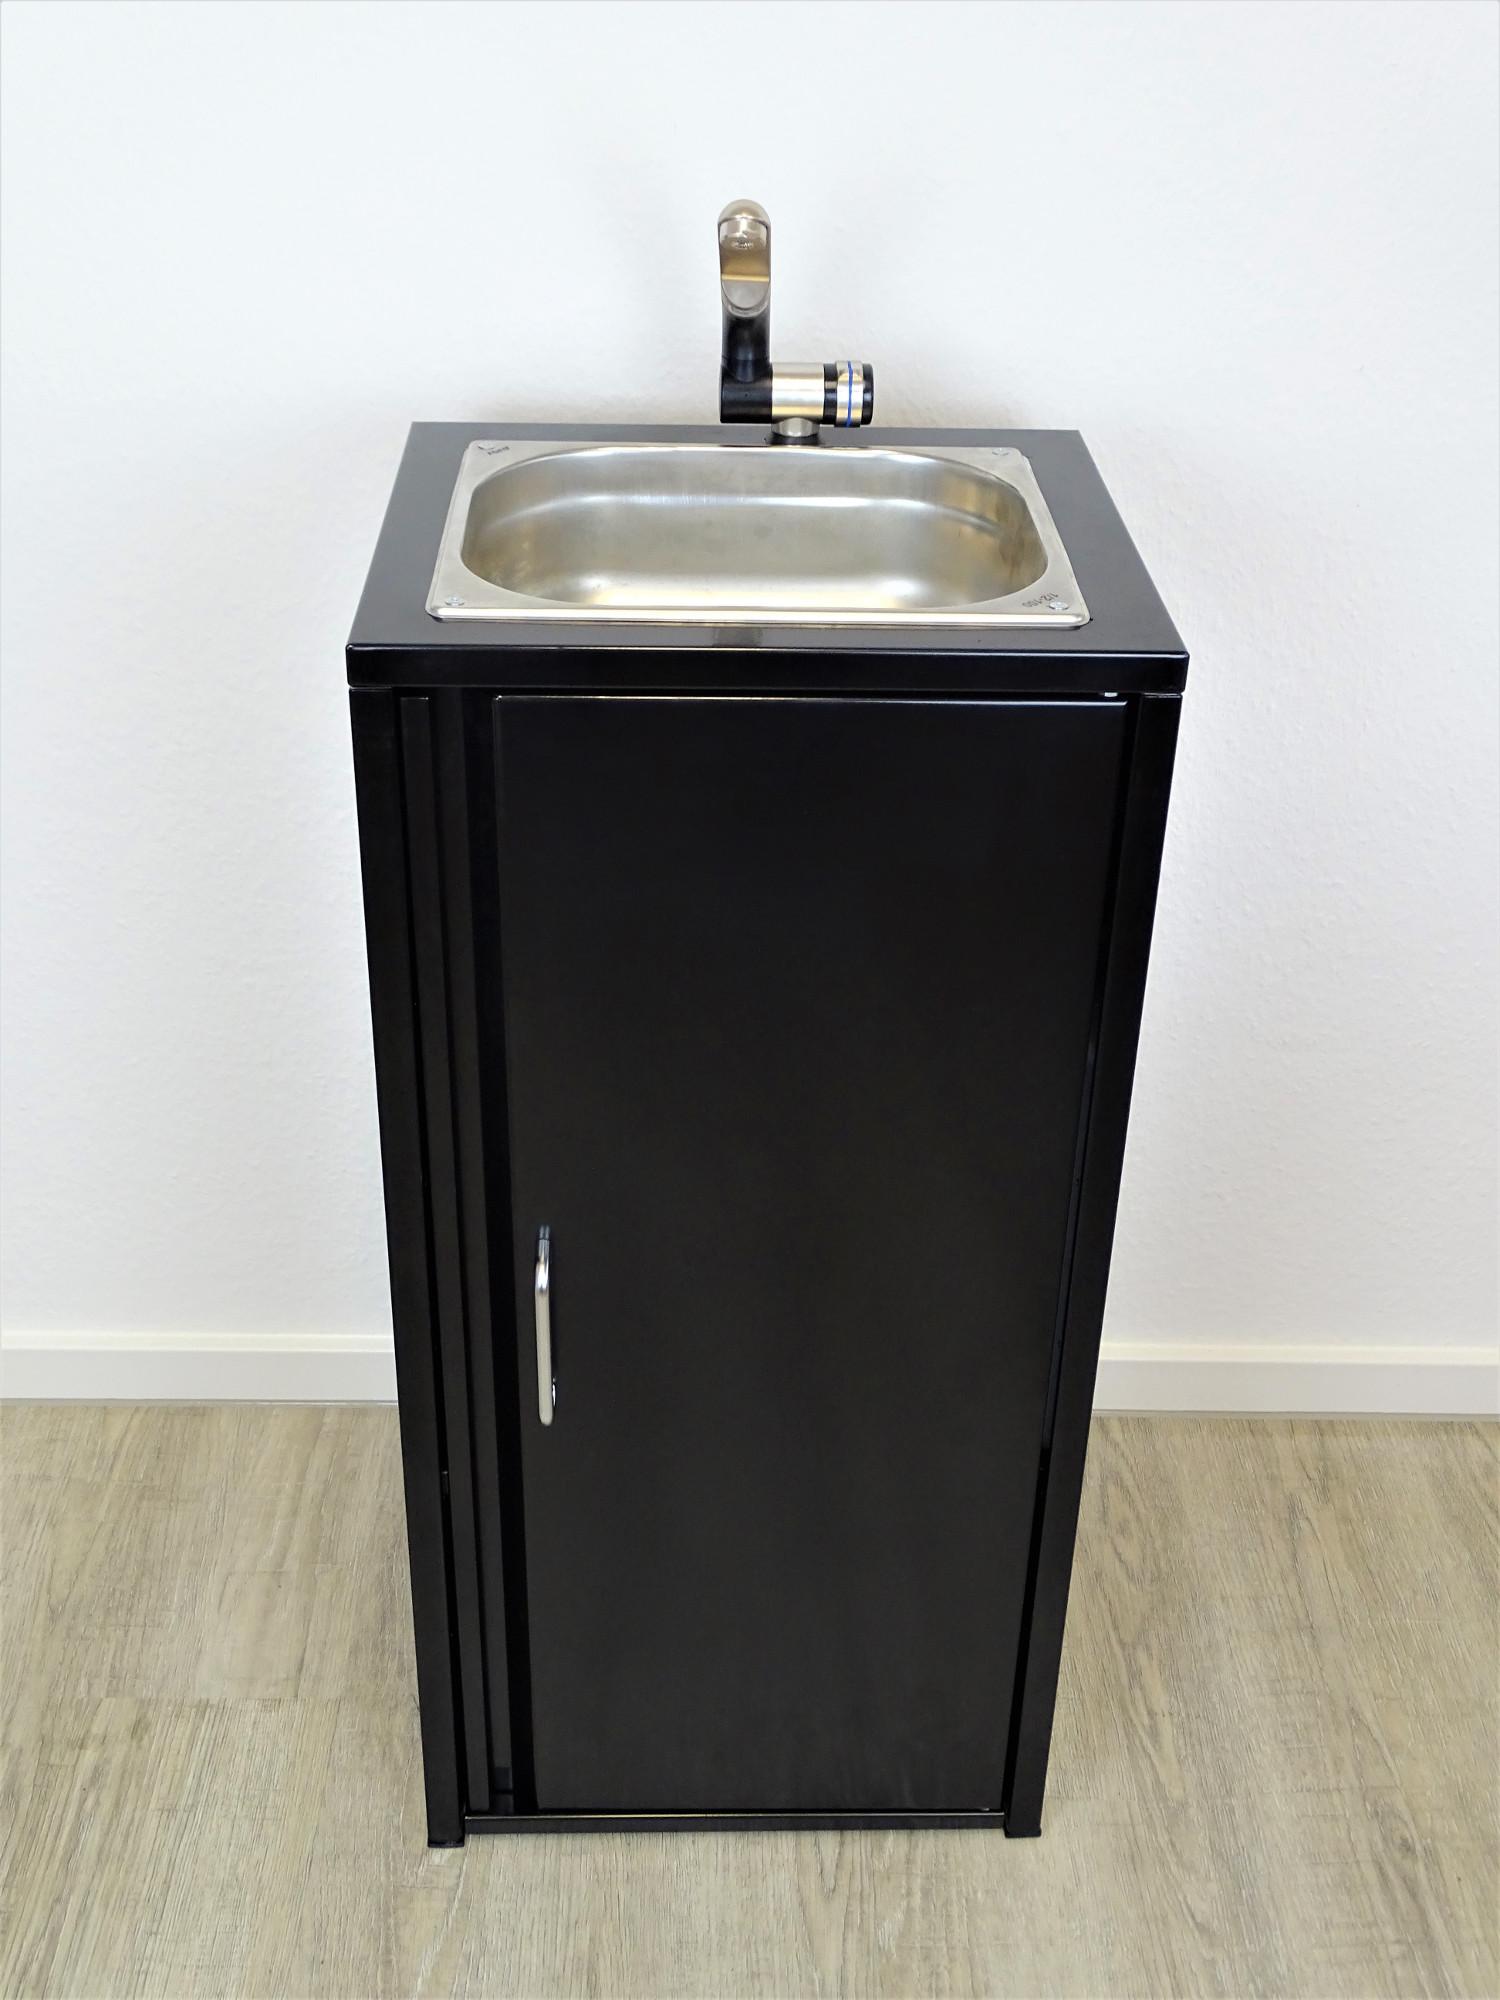 mobiles waschbecken edelstahl sp lbecken handwaschbecken. Black Bedroom Furniture Sets. Home Design Ideas